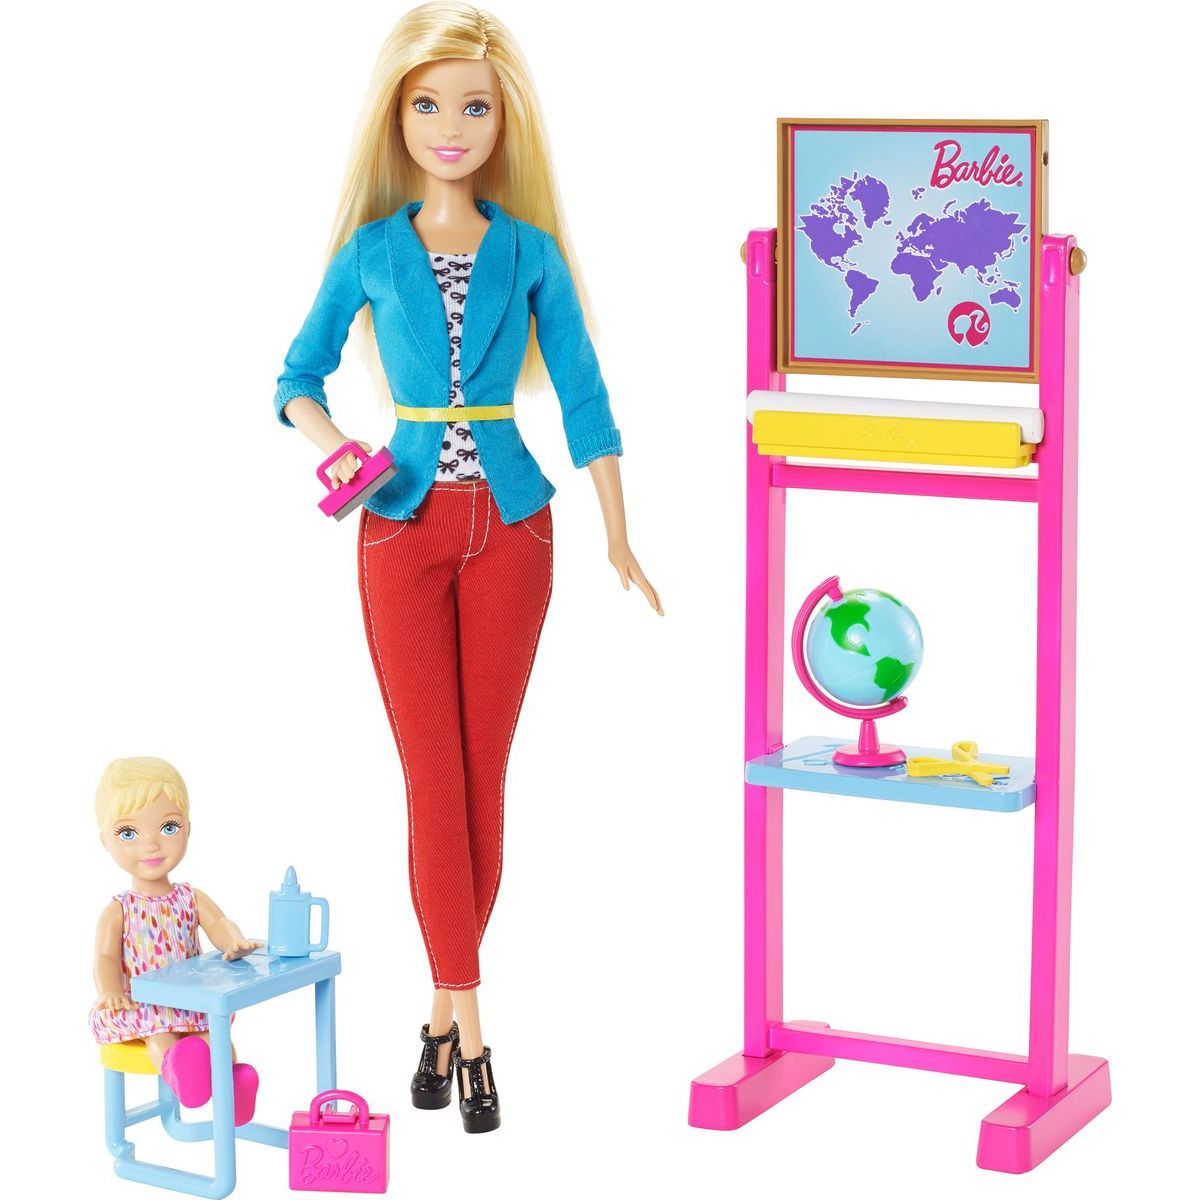 Barbie profese - Učitelka